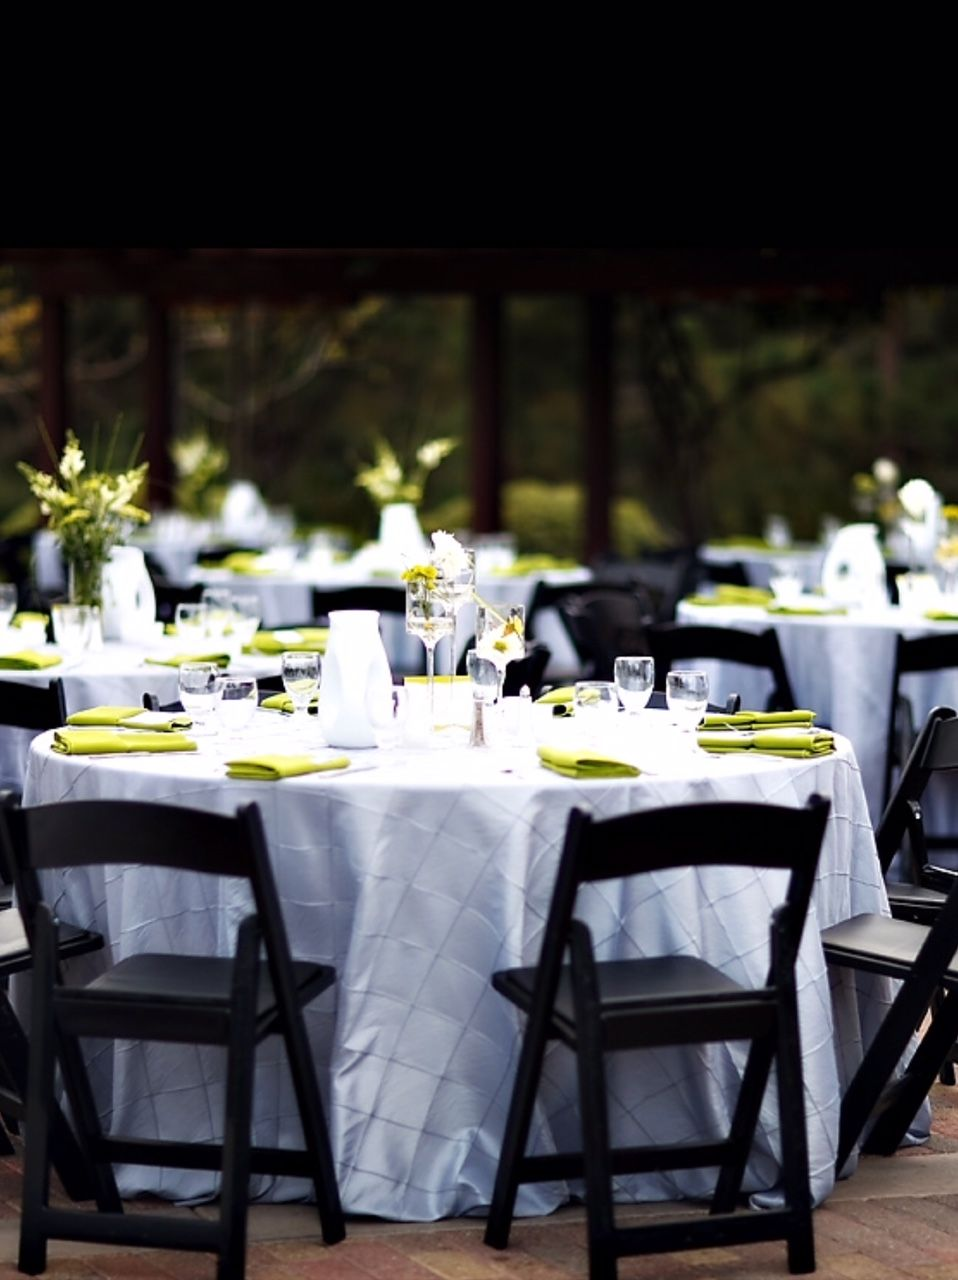 chair cover rentals dallas texas slip covered black garden folding in tx 214 484 2489